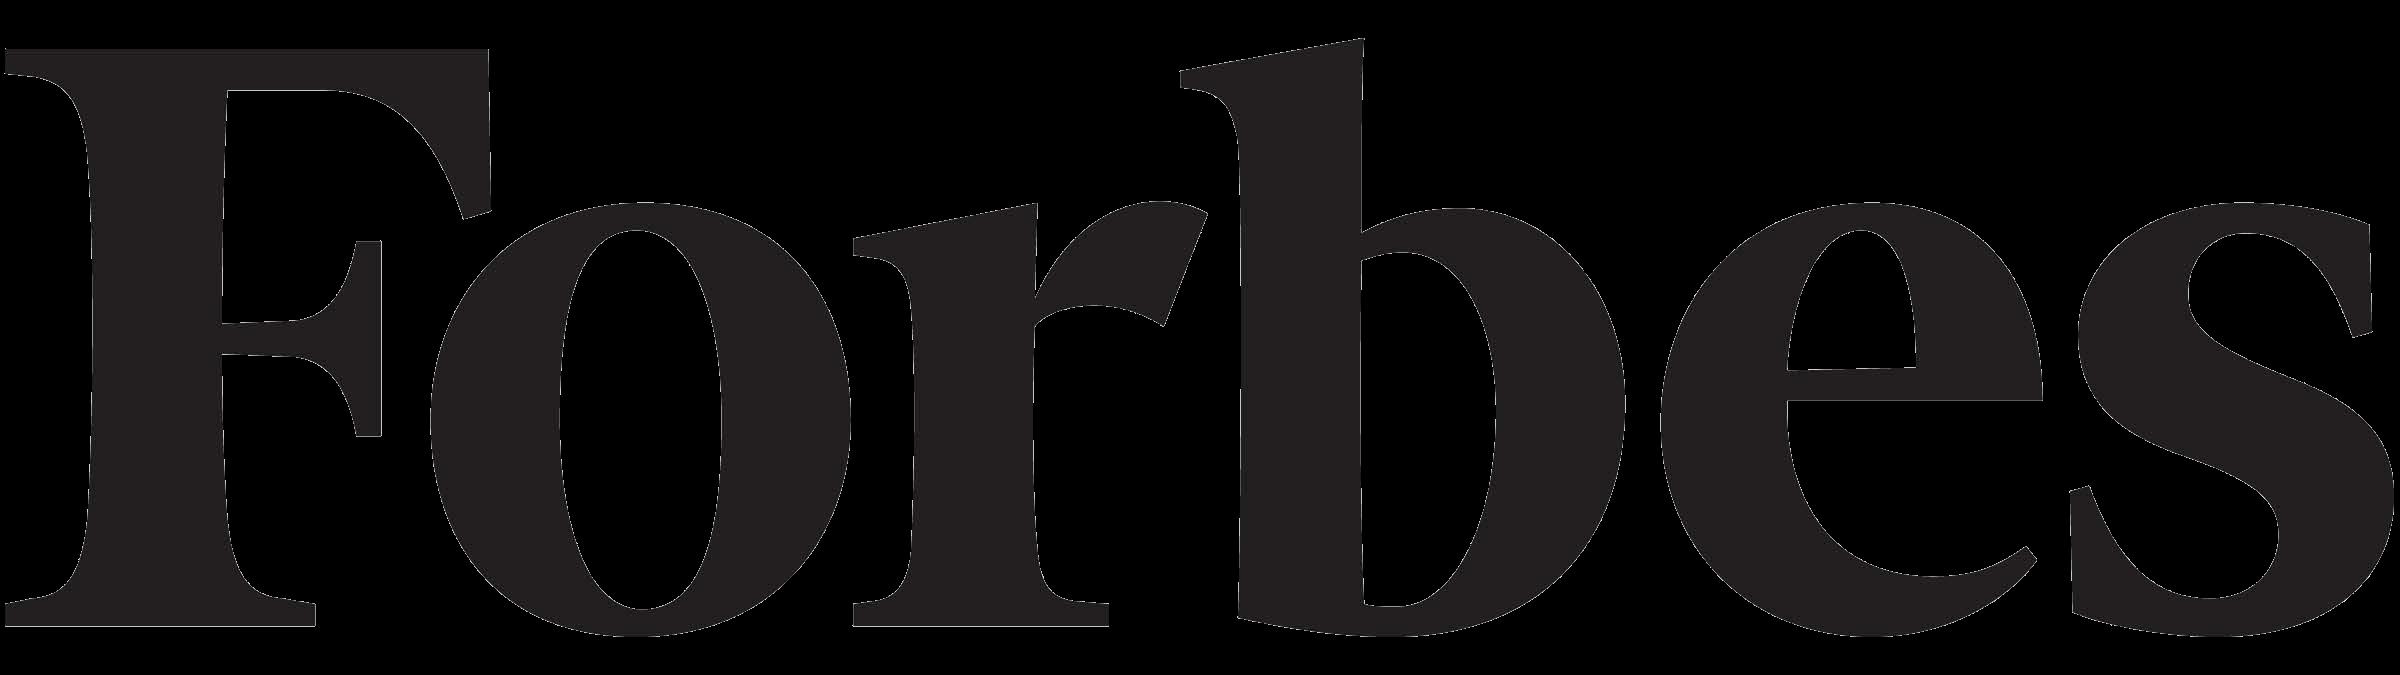 Forbs logo